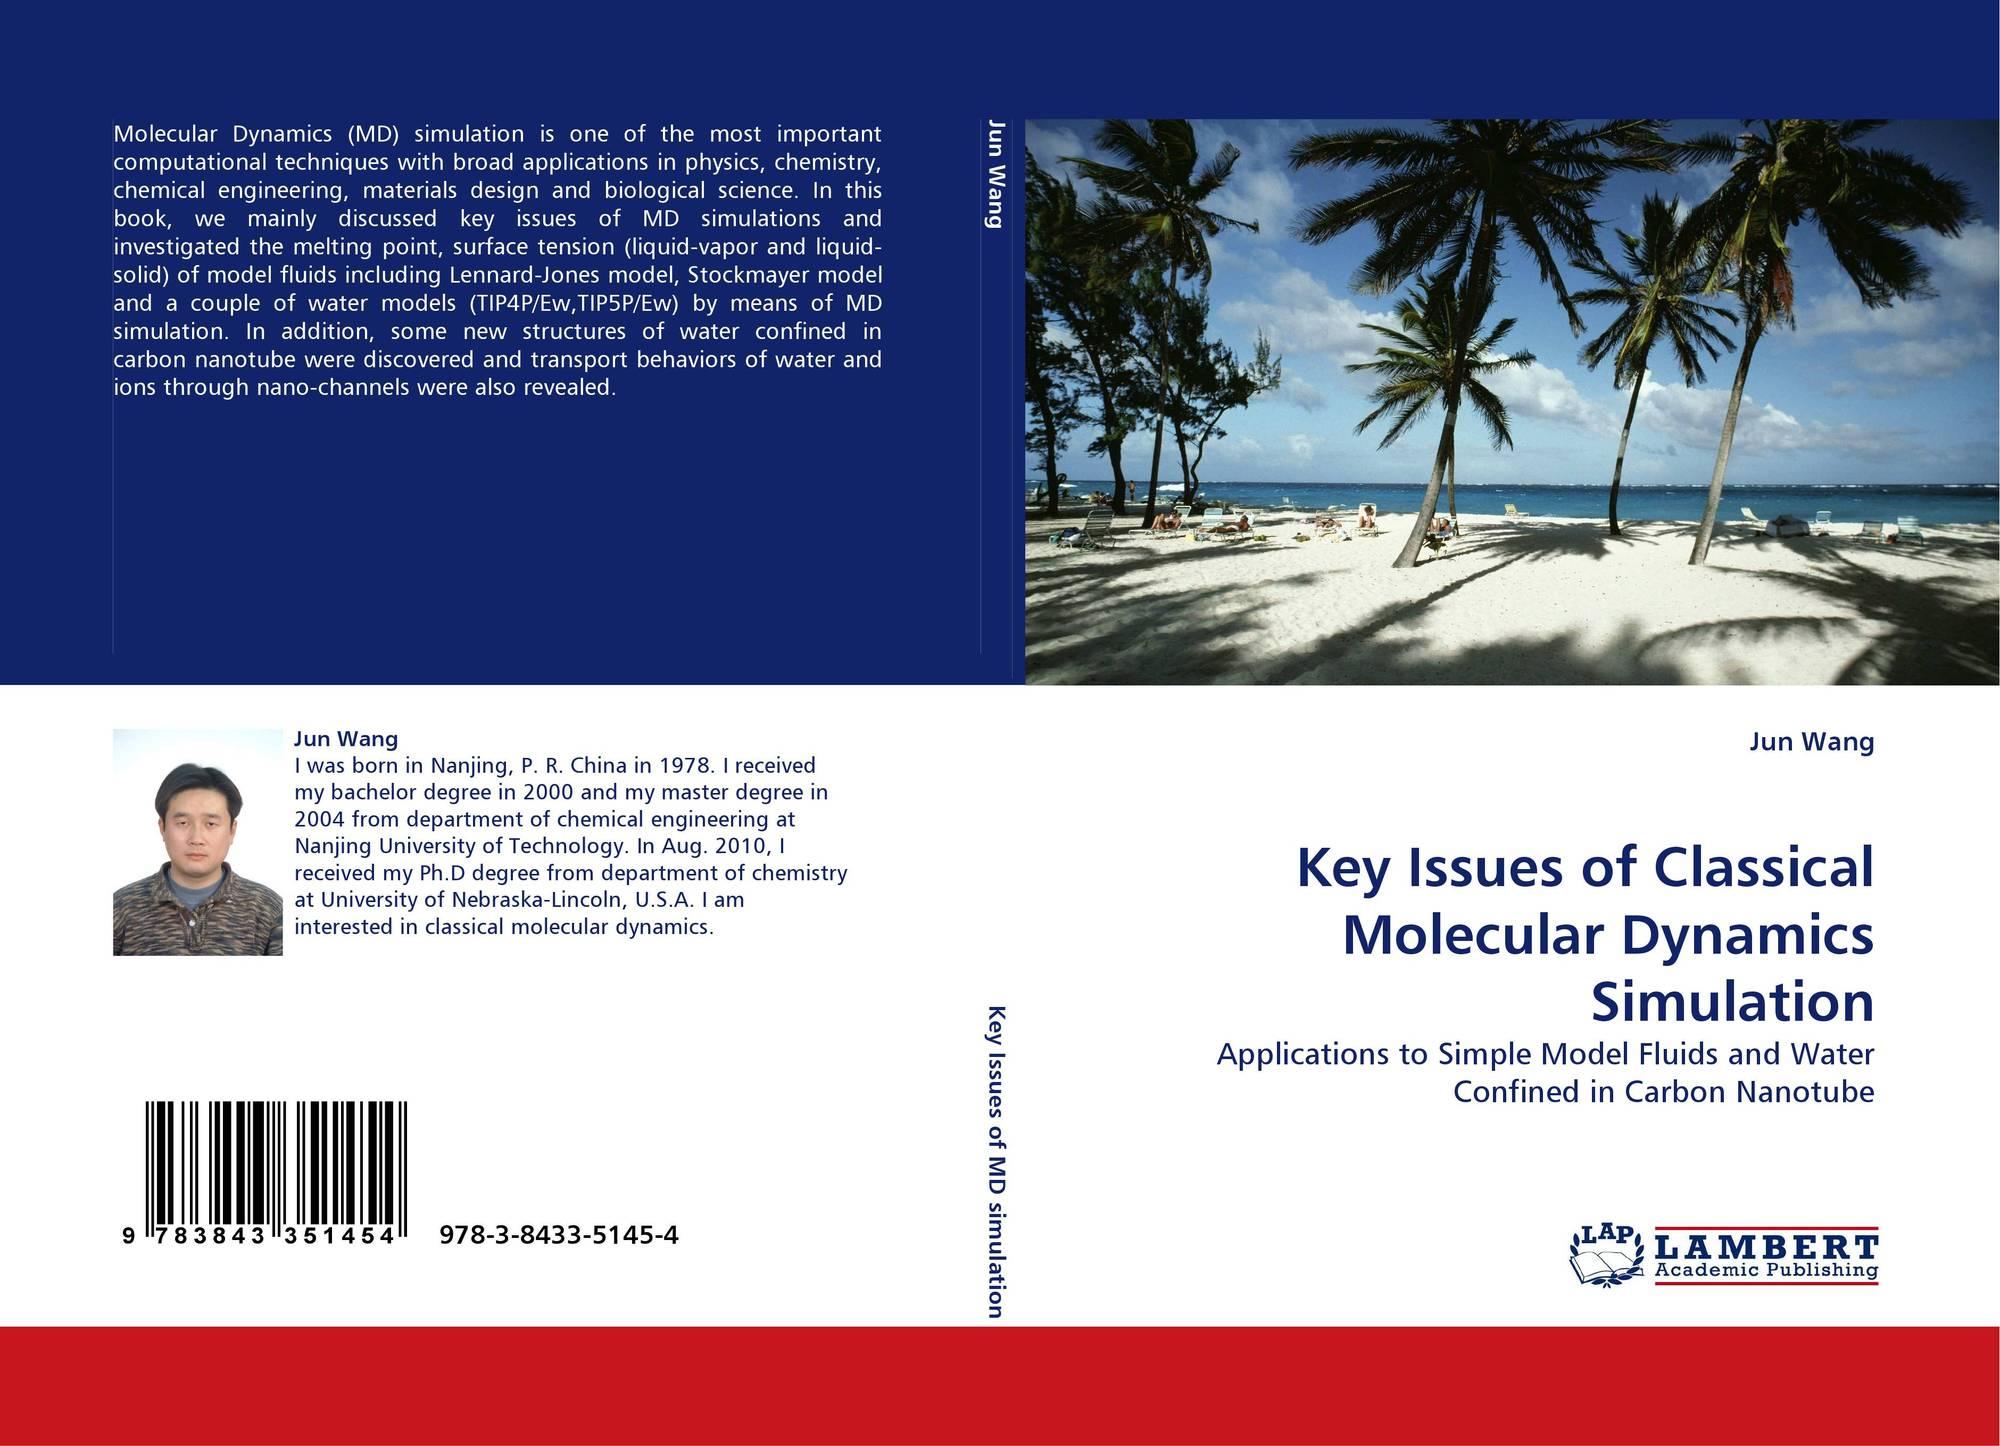 Key Issues of Classical Molecular Dynamics Simulation, 978-3